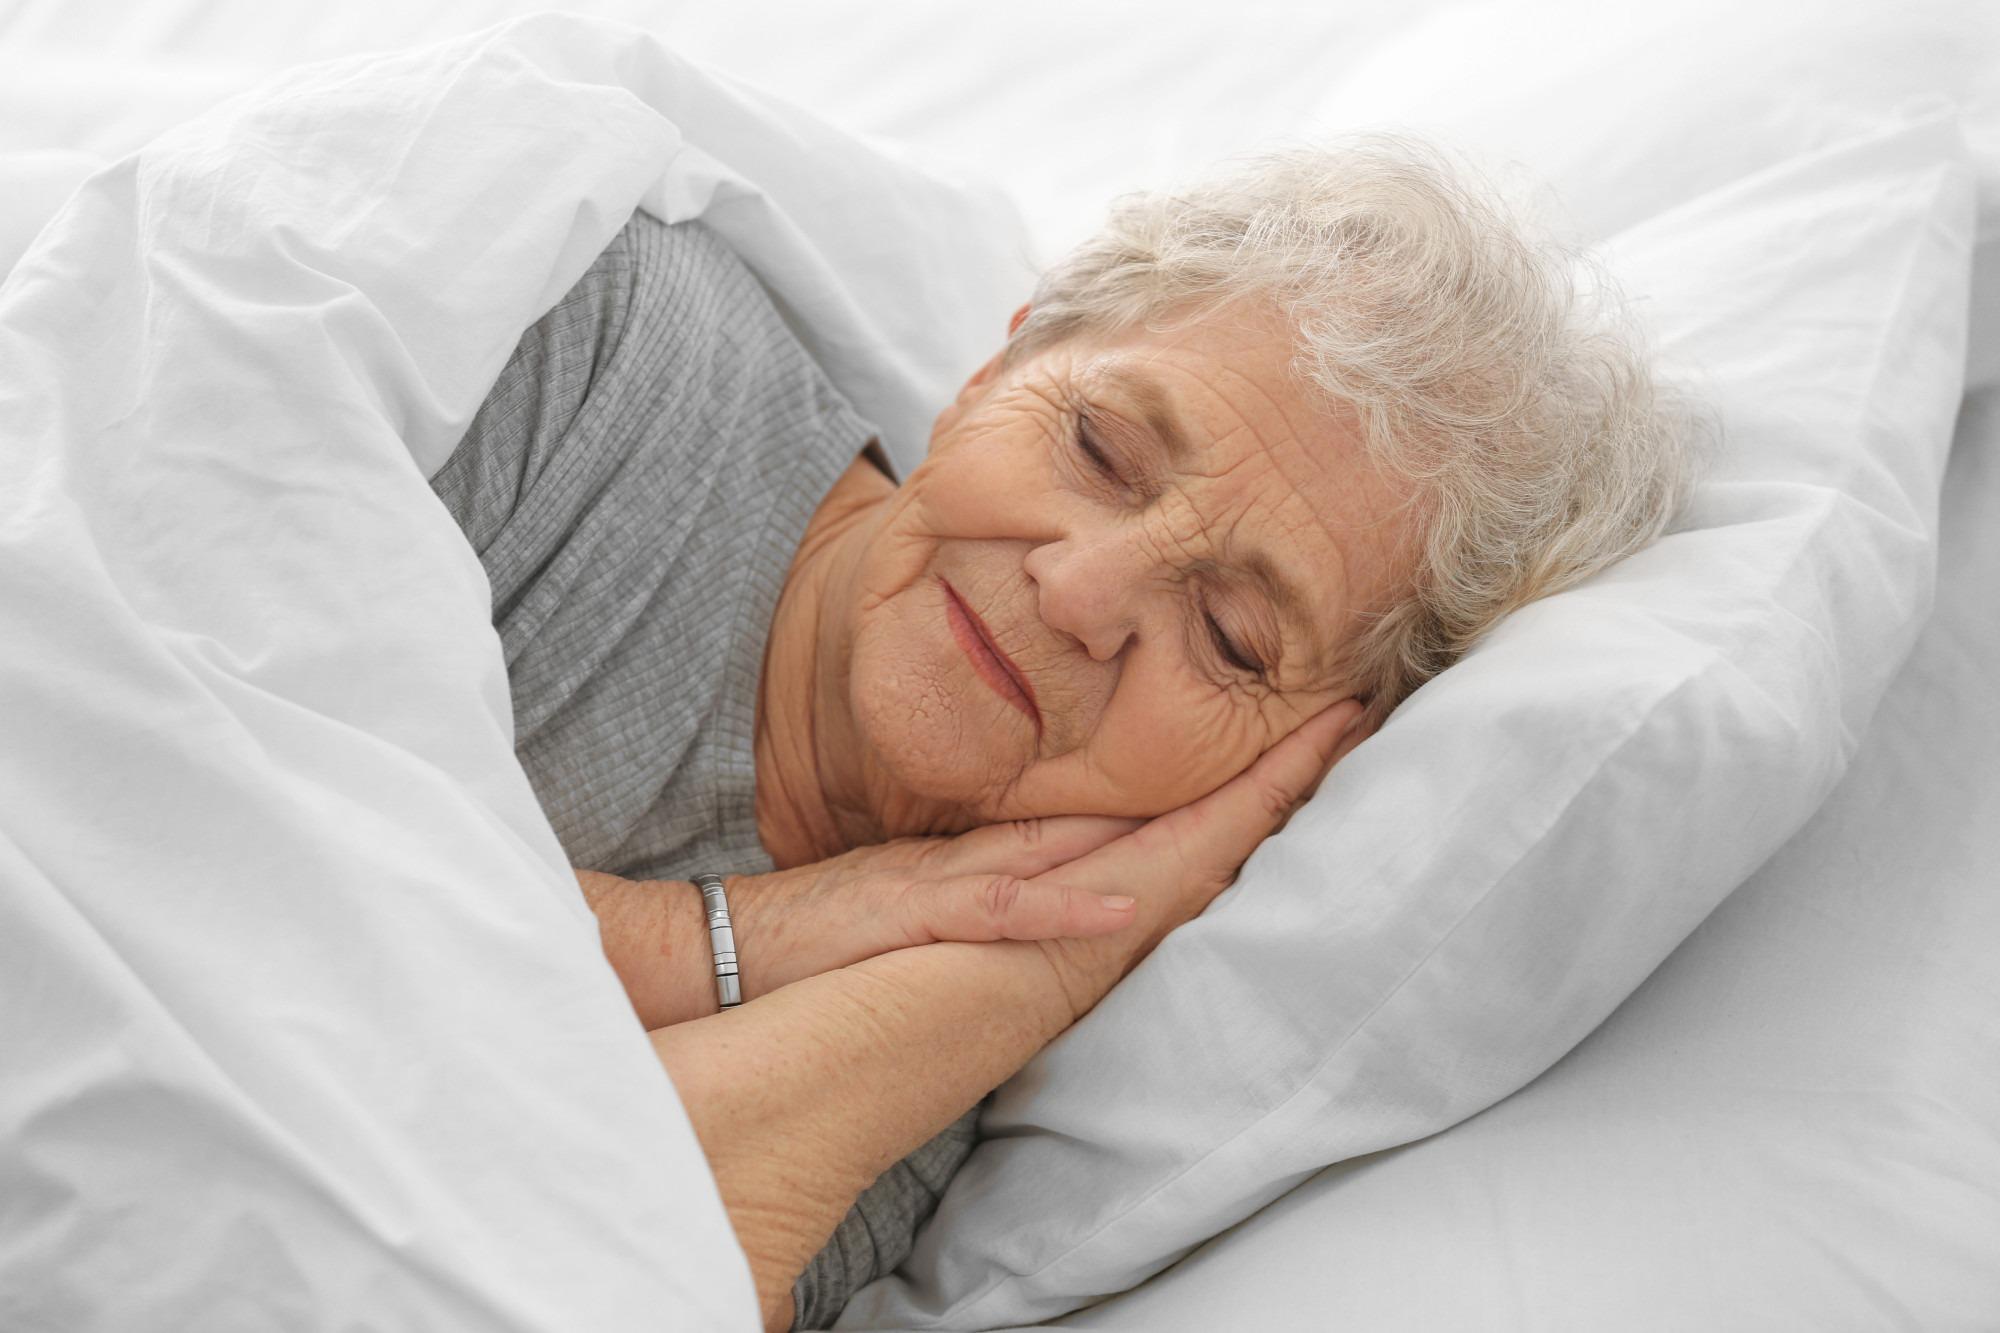 Aging and Sleep: 11 Sleeping Tips for Older Adults